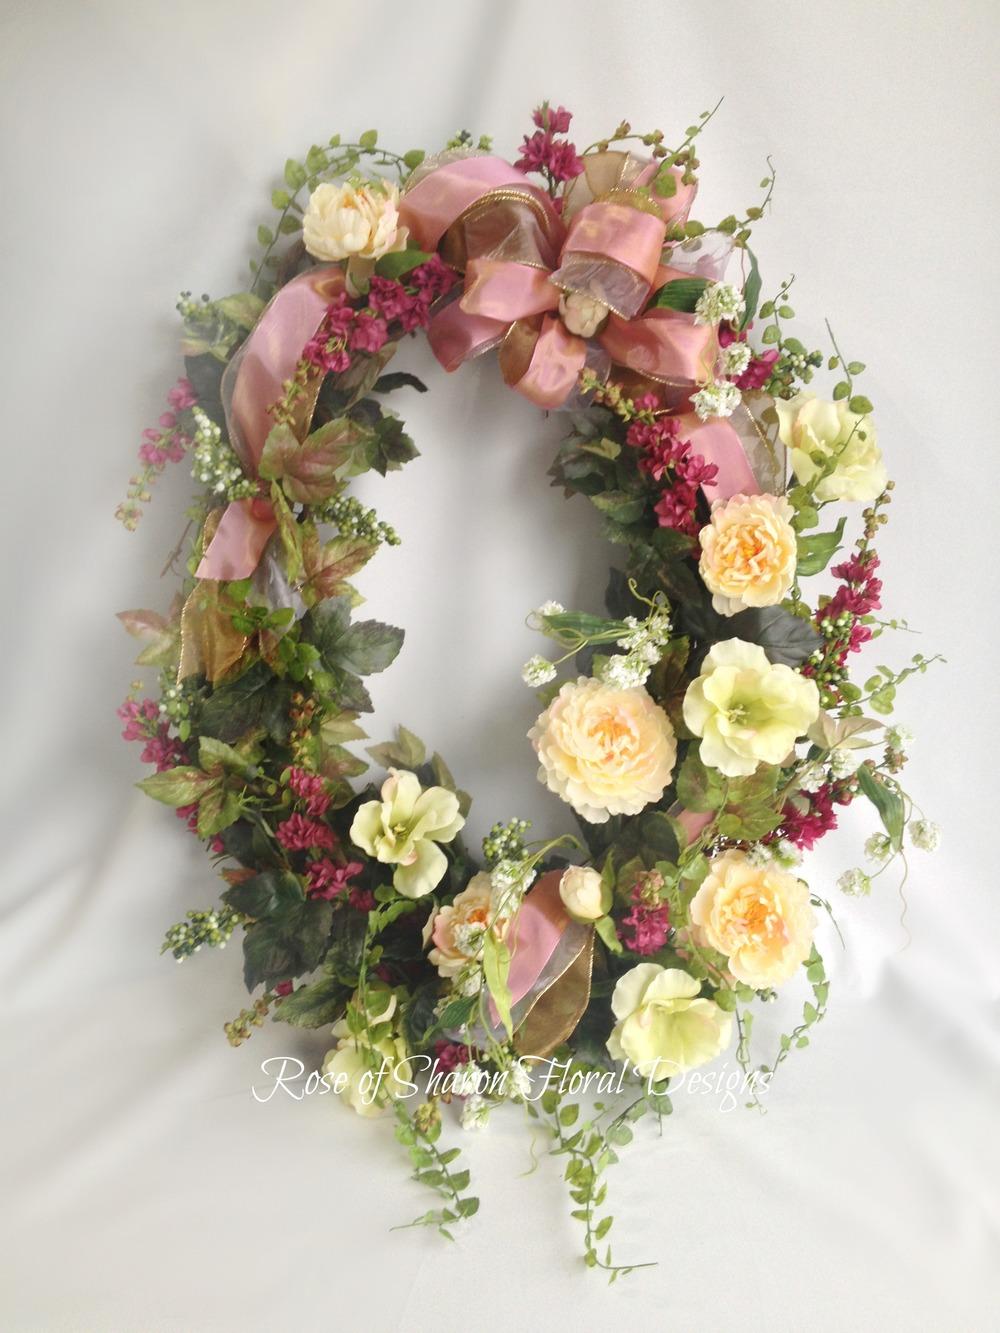 English Garden Silk Wreath, Rose of Sharon Floral Designs